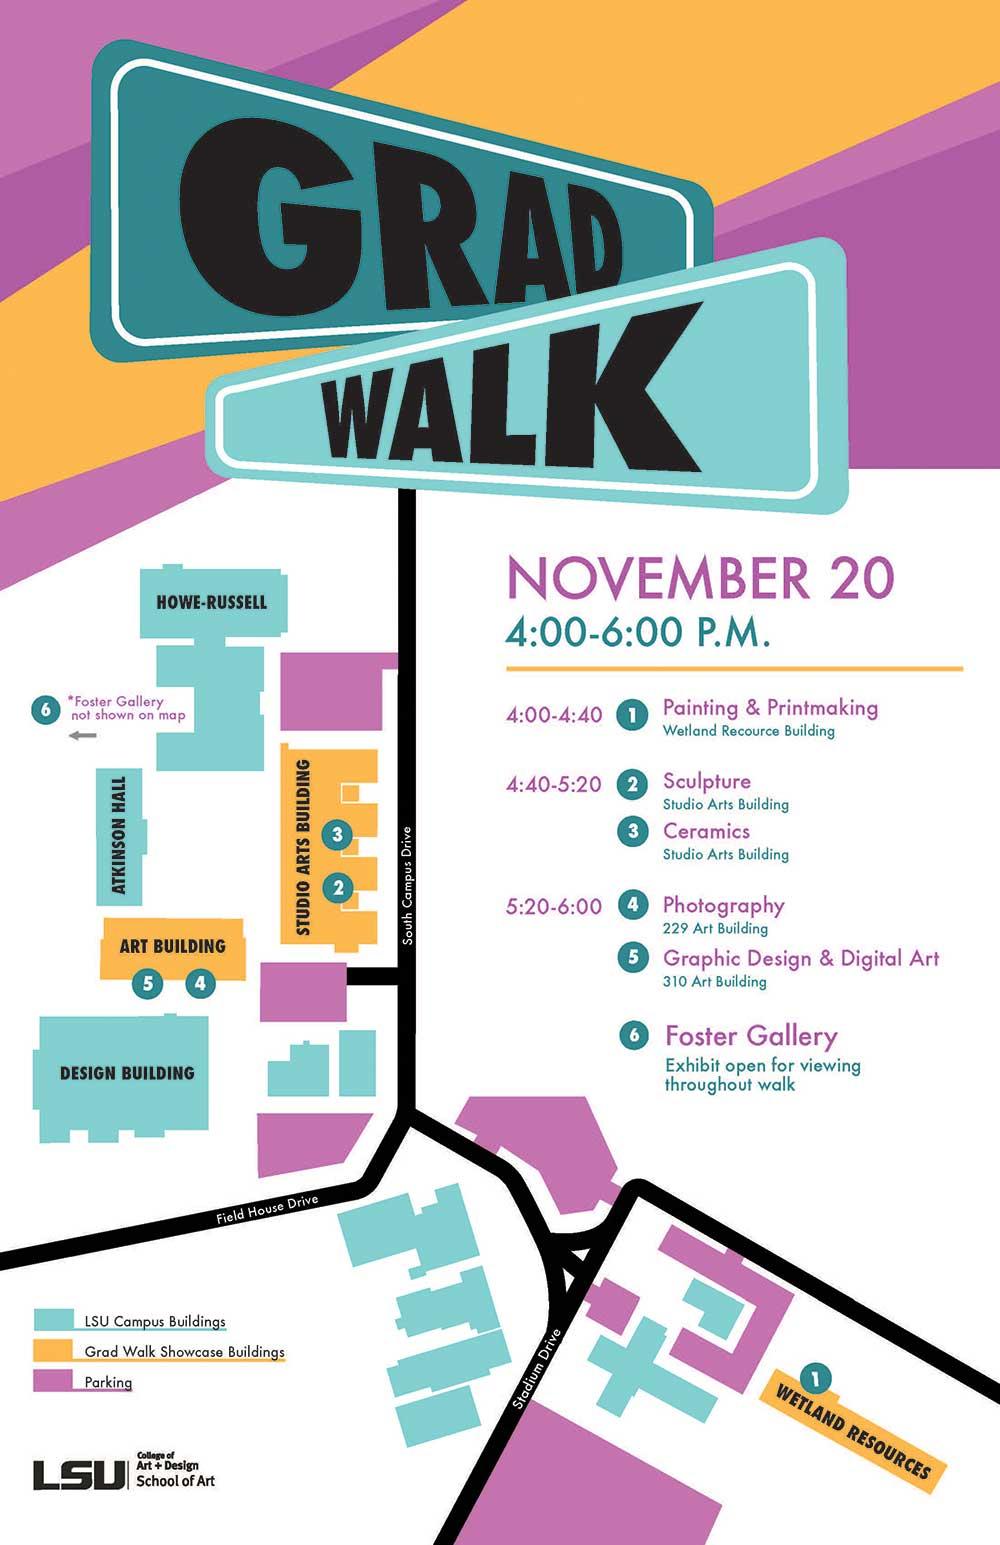 lsu school of art grad walk poster detailed